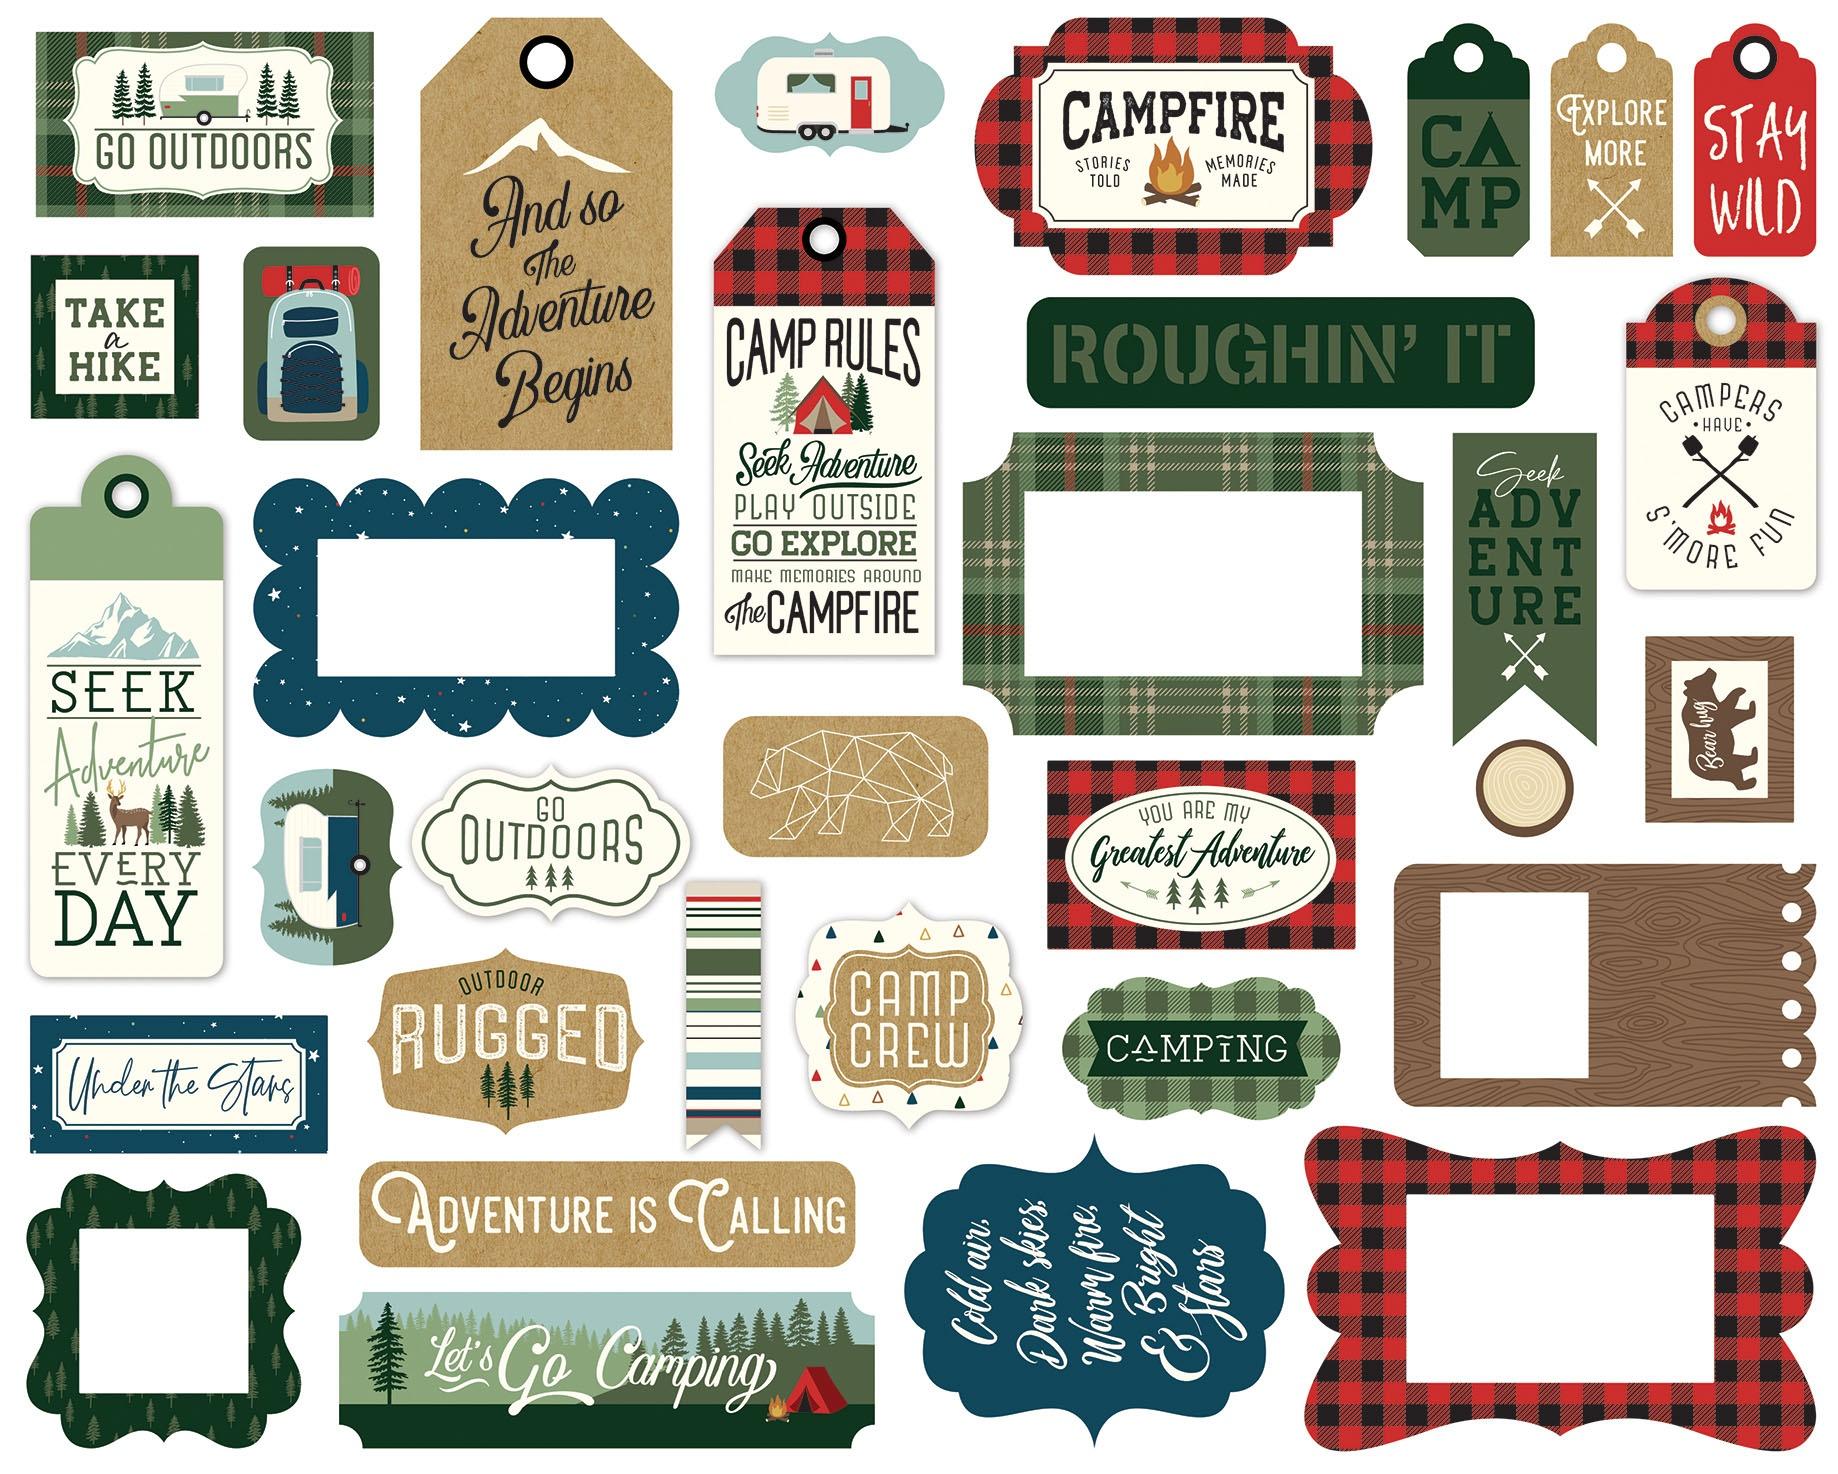 Echo Park Cardstock Ephemera 33/Pkg-Frames & Tags, Let's Go Camping